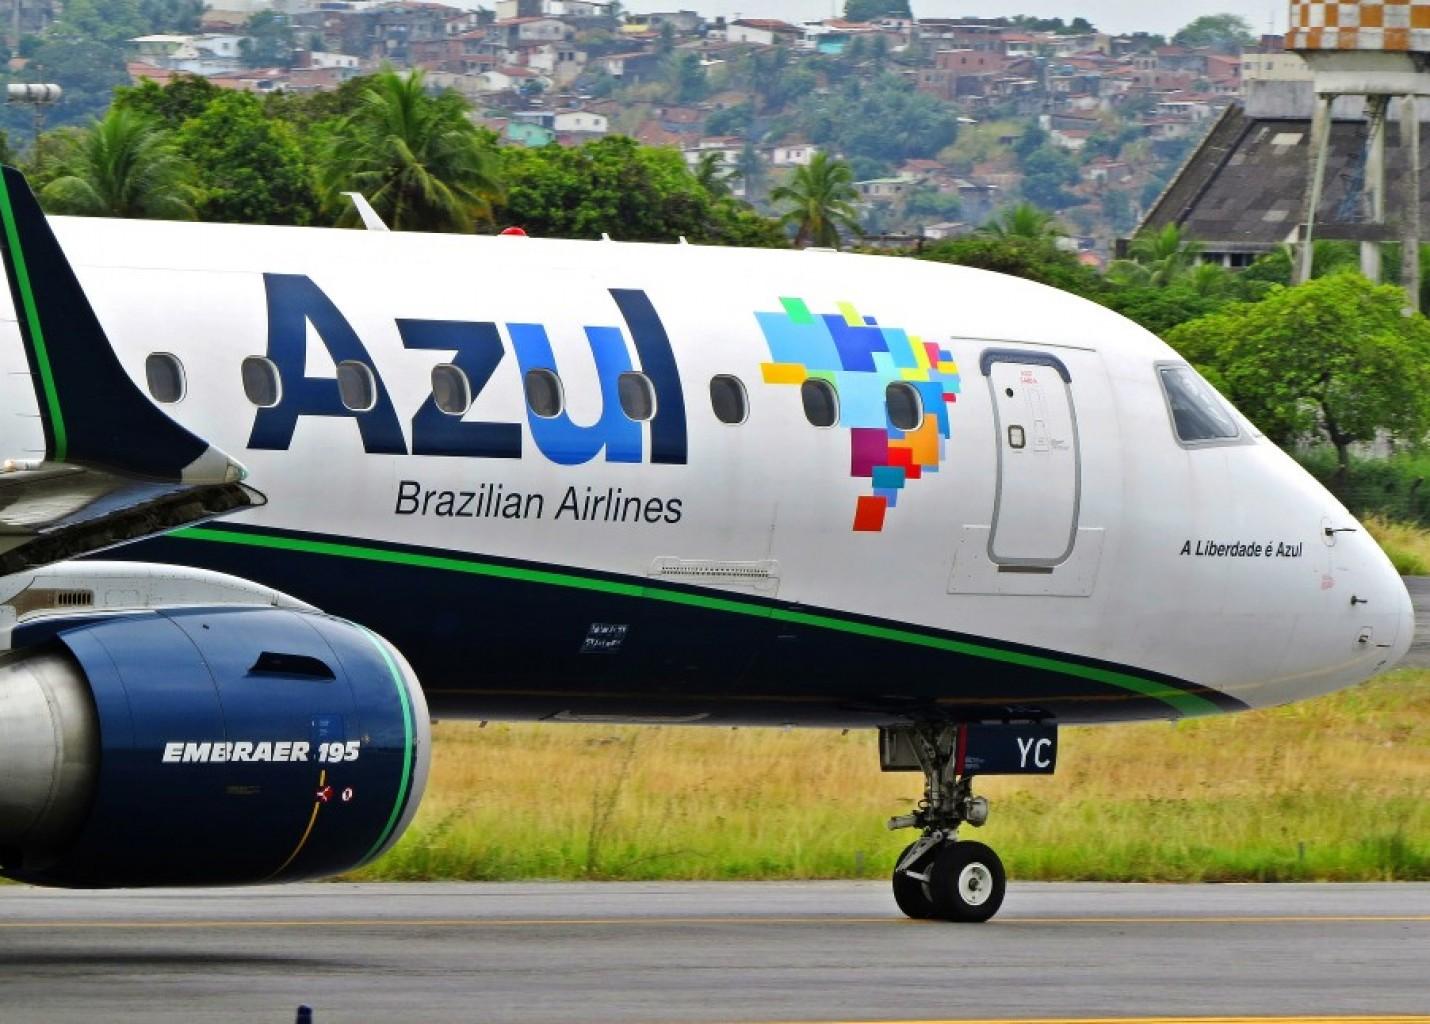 Azul solicita segundo voo diário entre Buenos Aires e Belo Horizonte